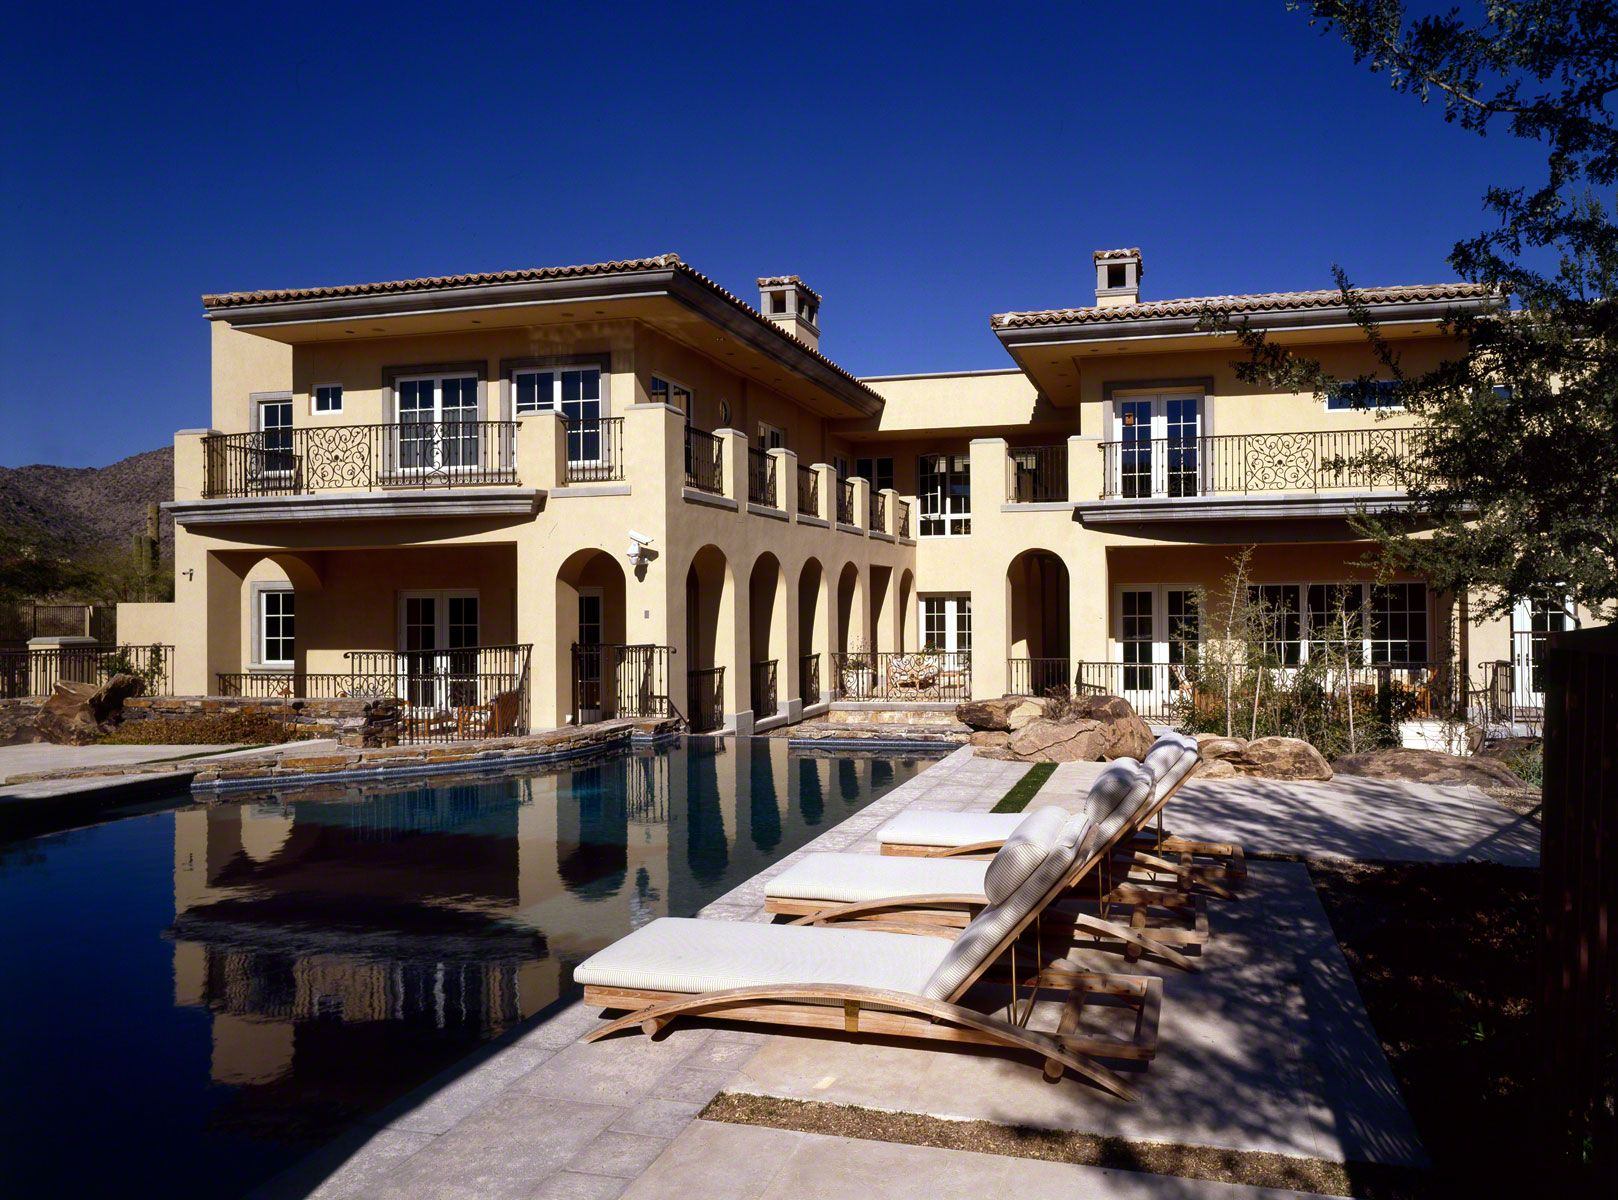 AZ Custom Built California Spanish Revival Home Arizona Luxury - Luxury home builders in california